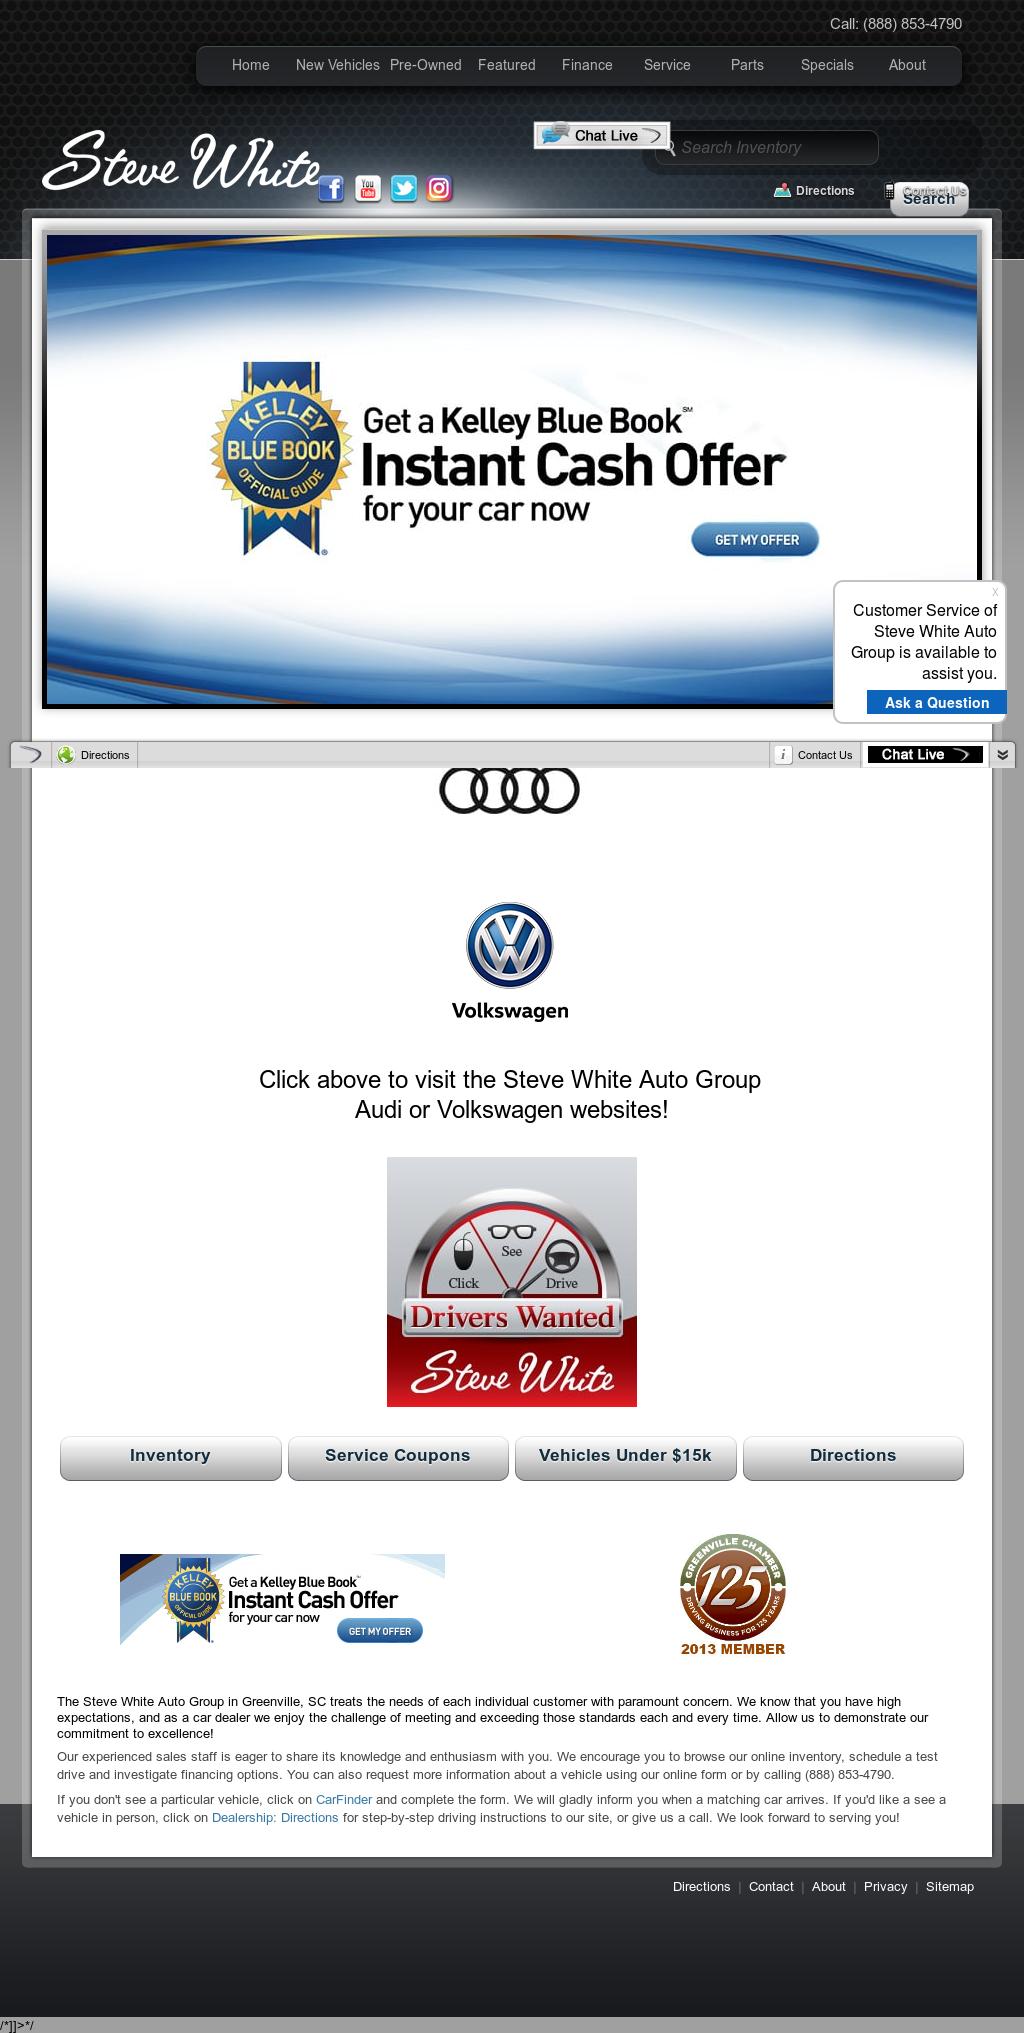 Steve White Vw Audi Competitors Revenue And Employees Owler - Steve white audi